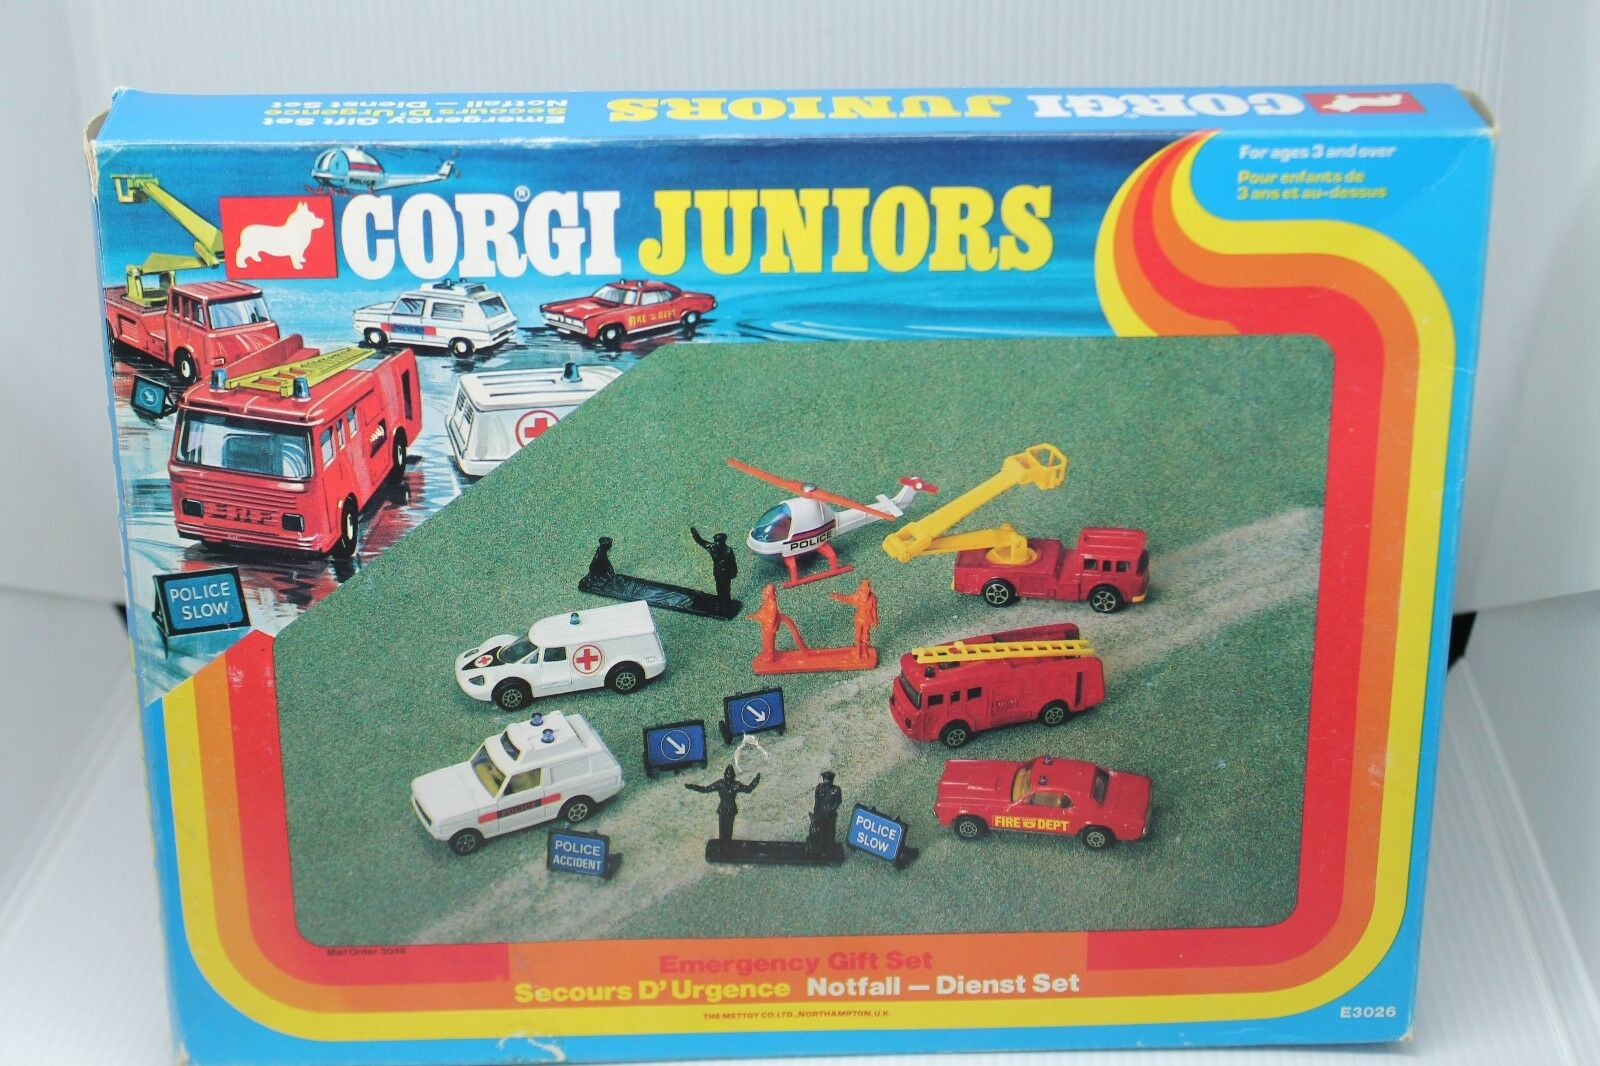 Corgi juniors  Emergency veneno set - 6 vehicles  OVP